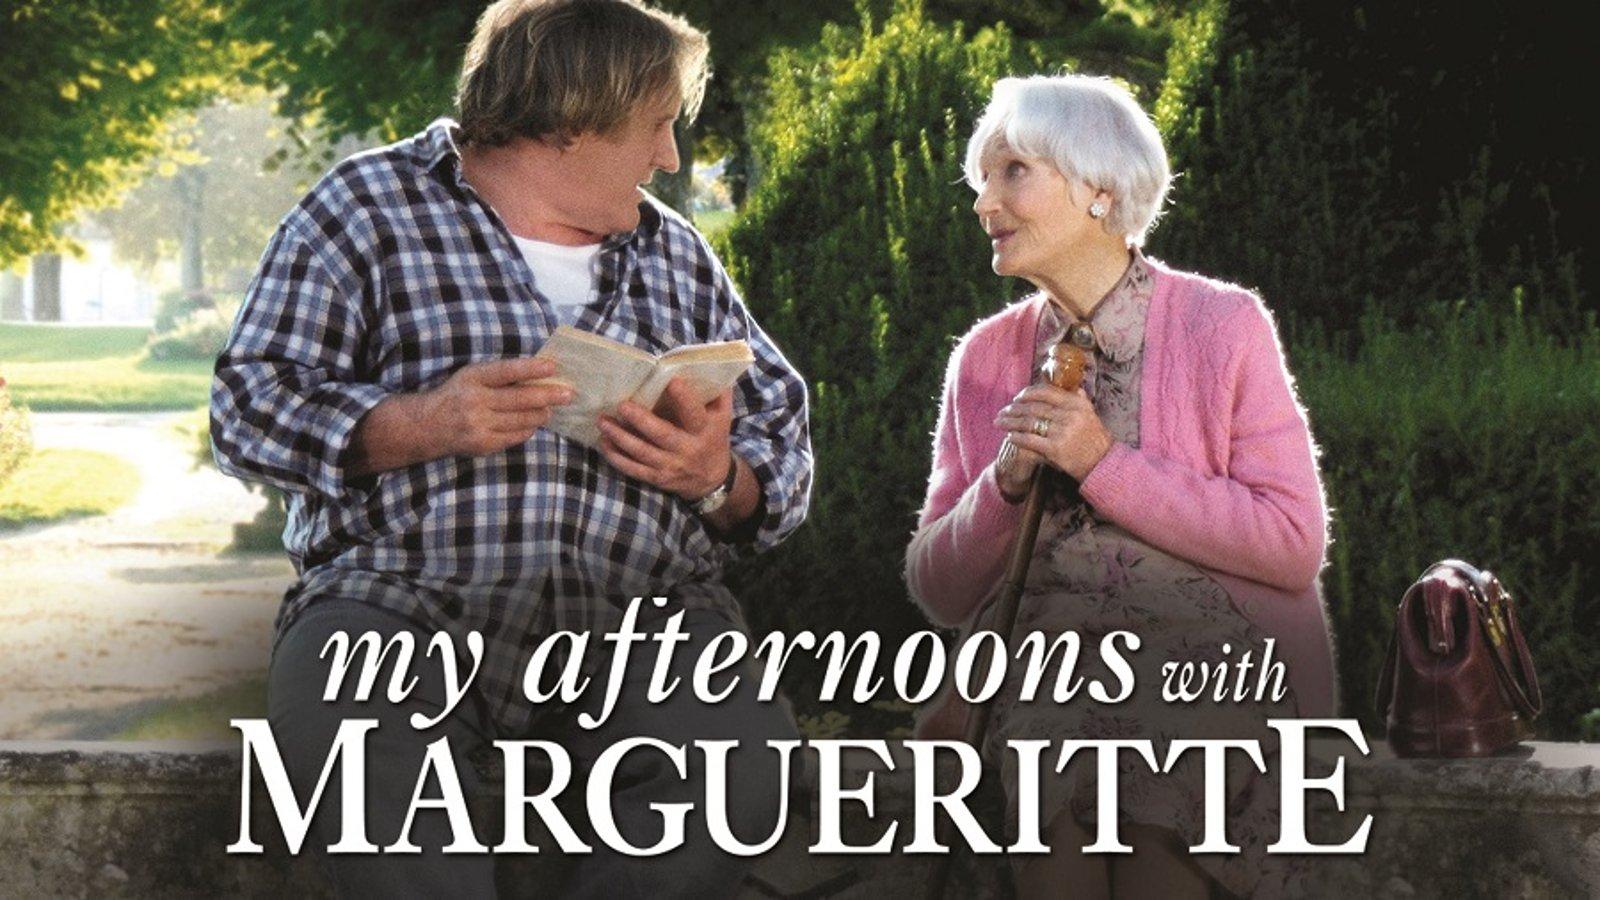 My Afternoons with Margueritte - La tête en friche